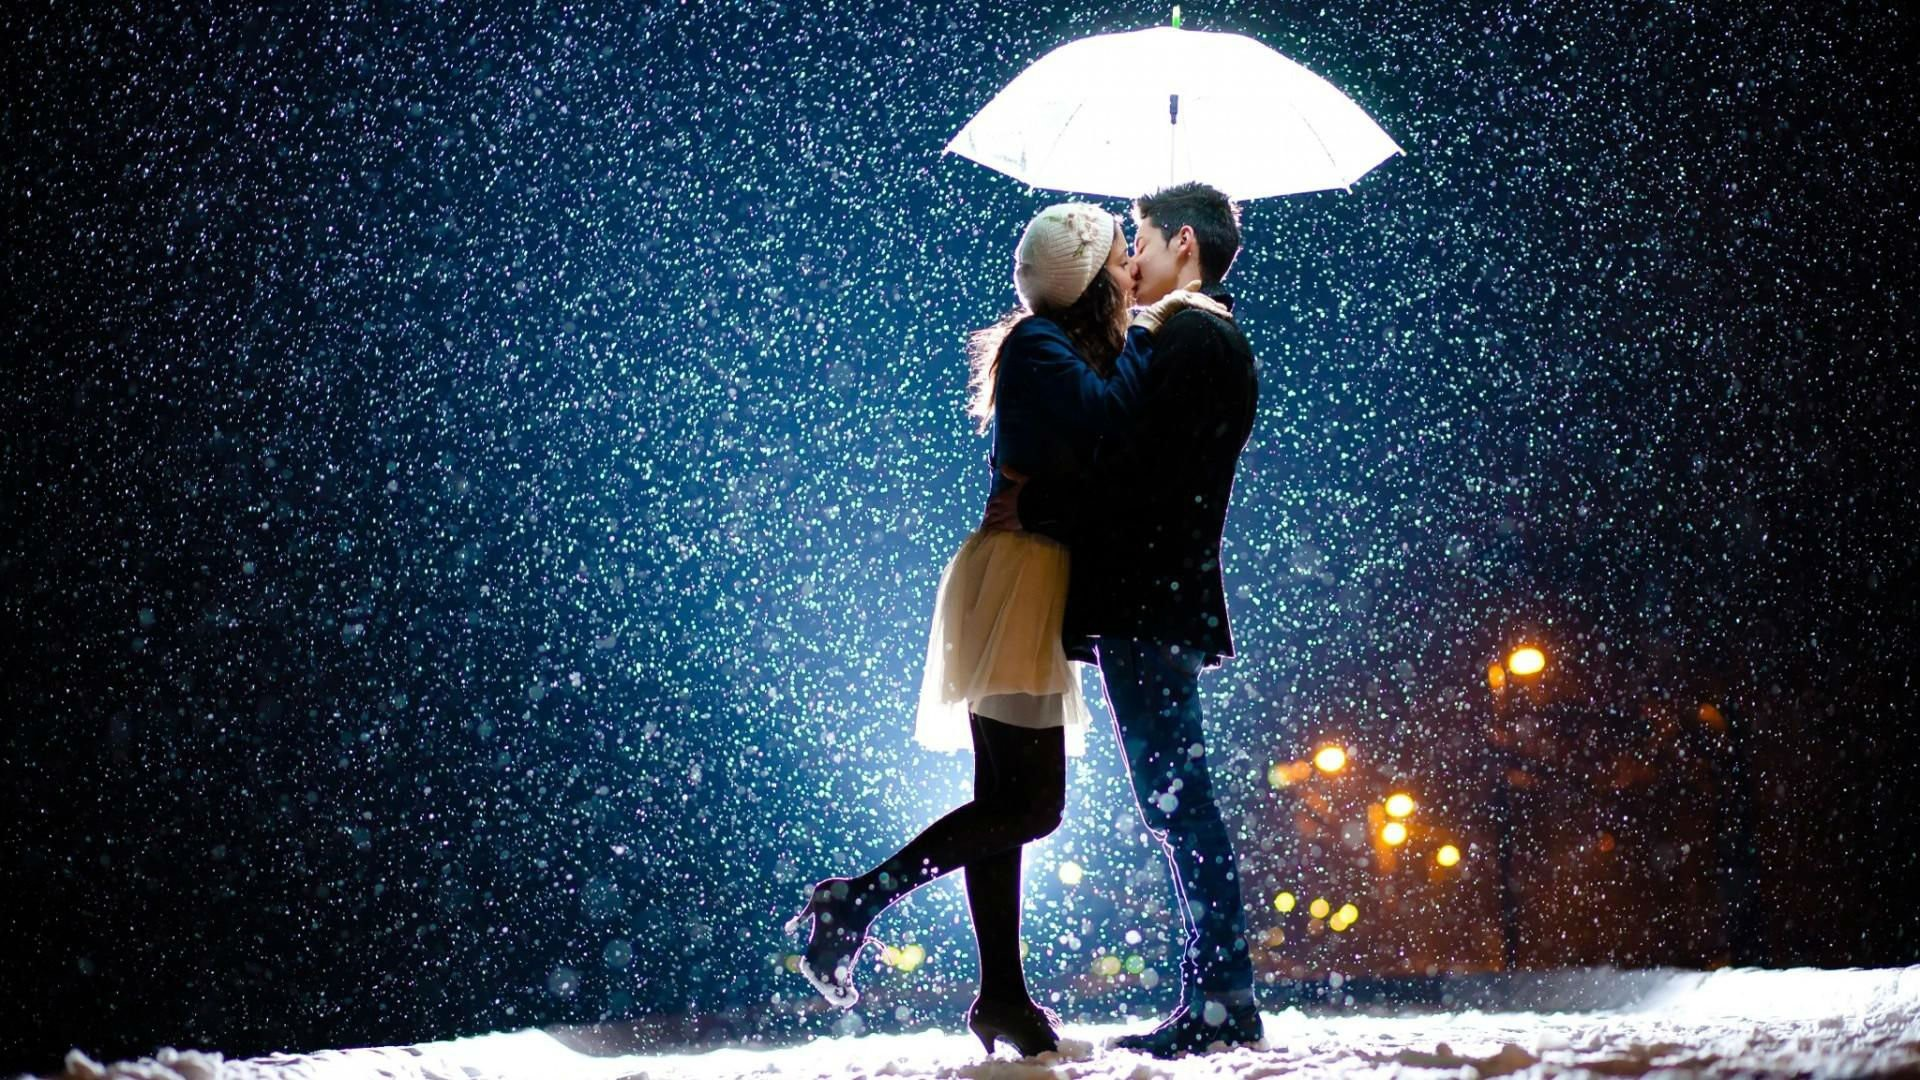 Winter Love Wallpaper 64 Images